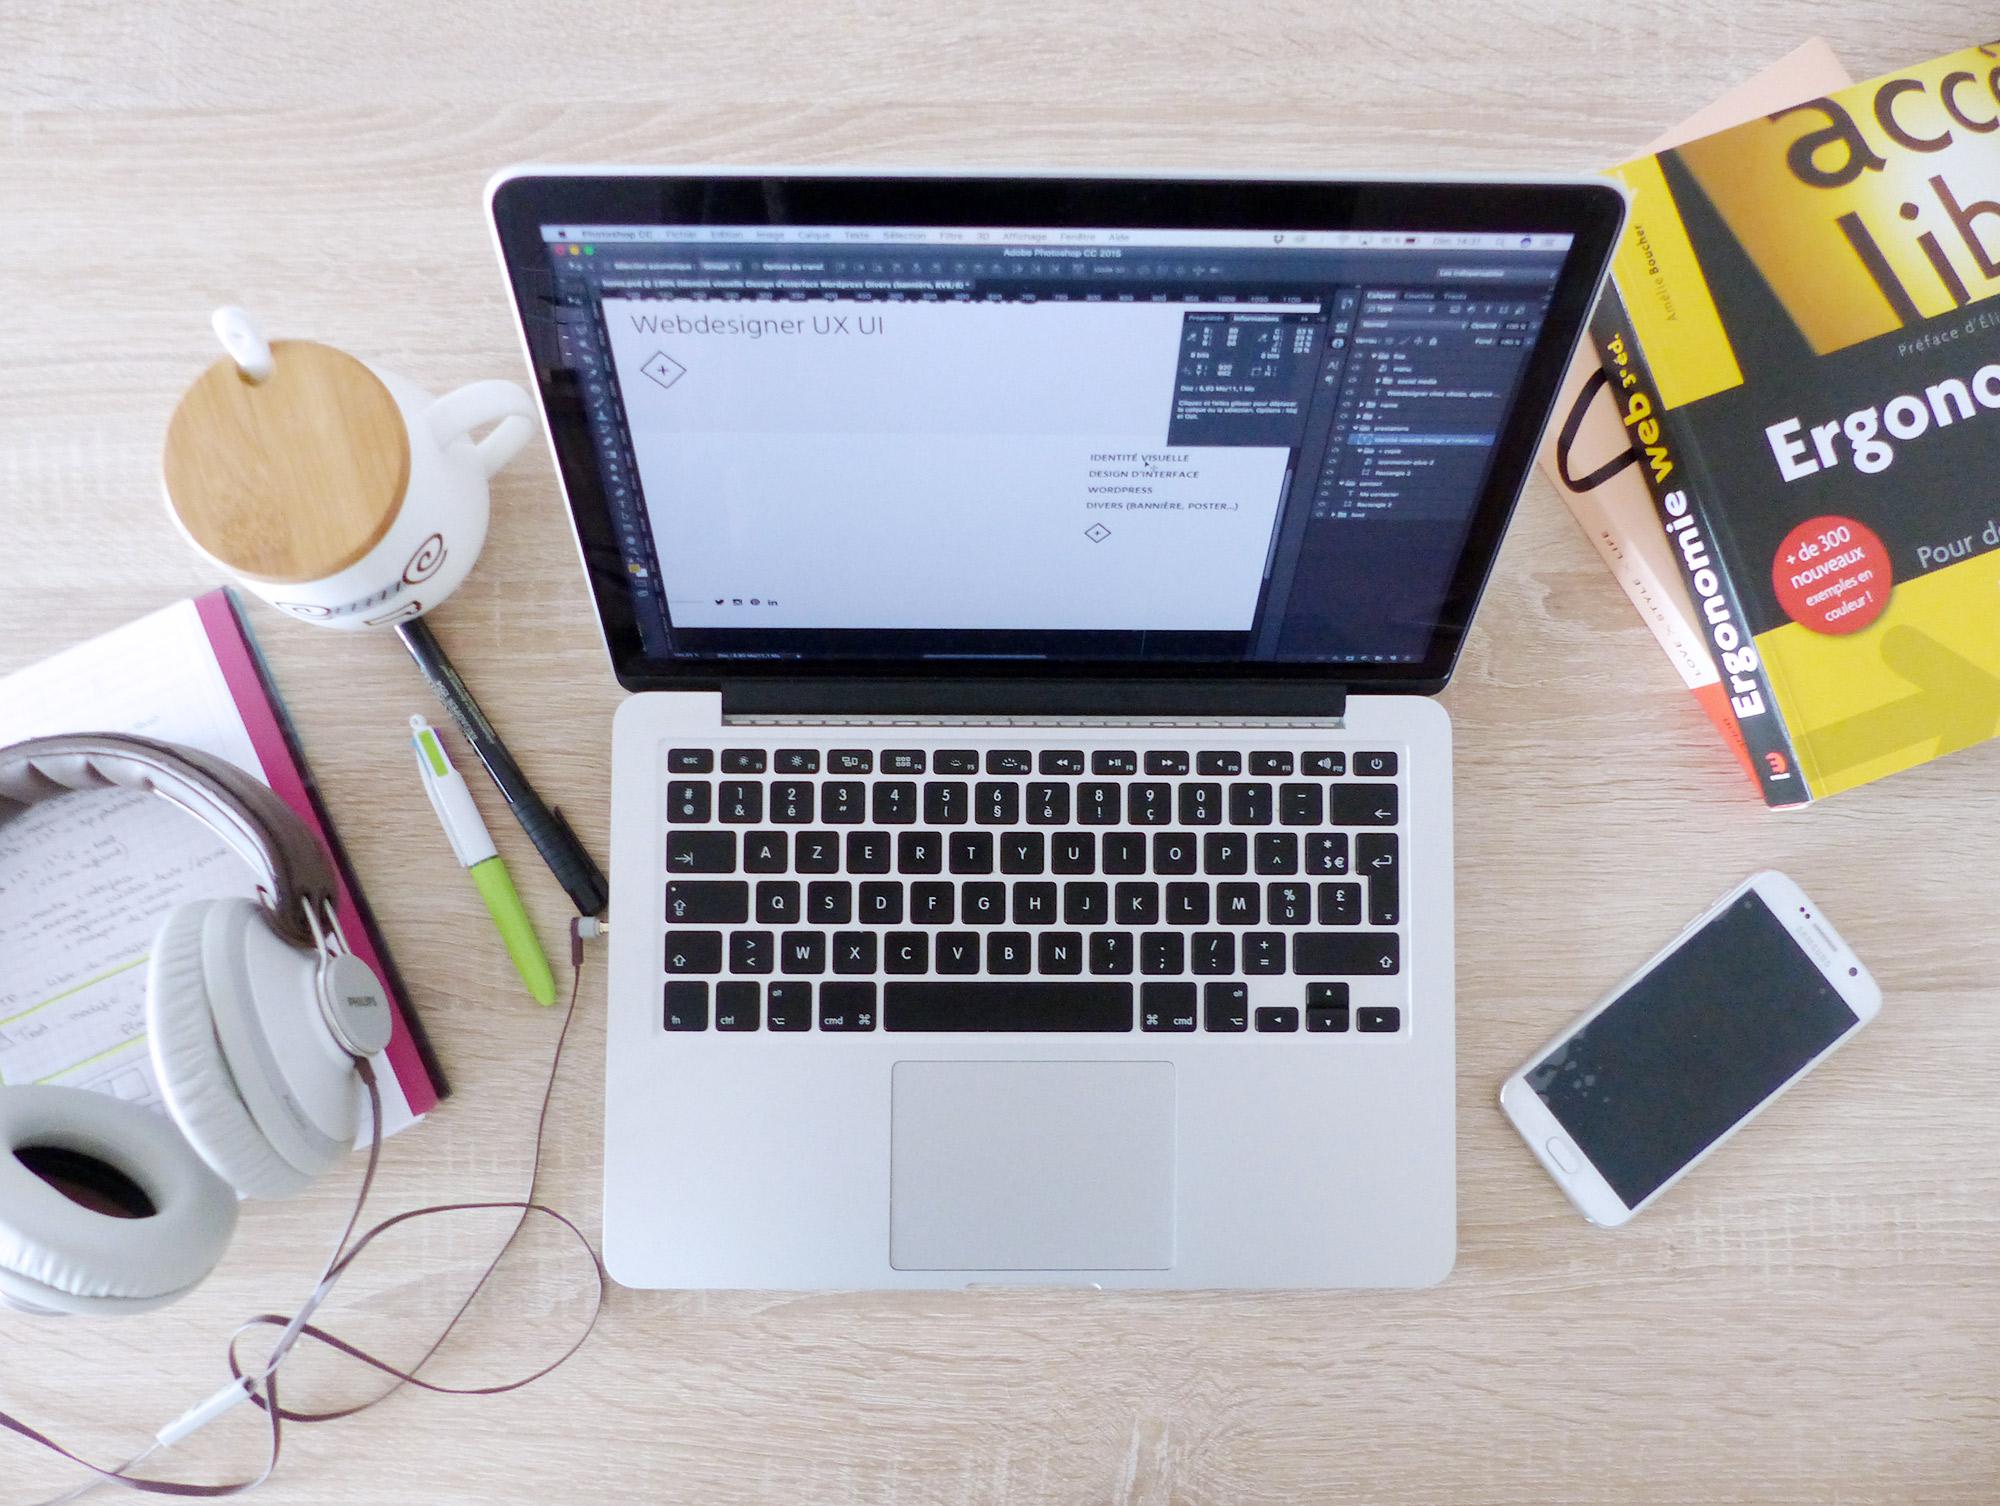 Autour de marine - Journée type Webdesigner